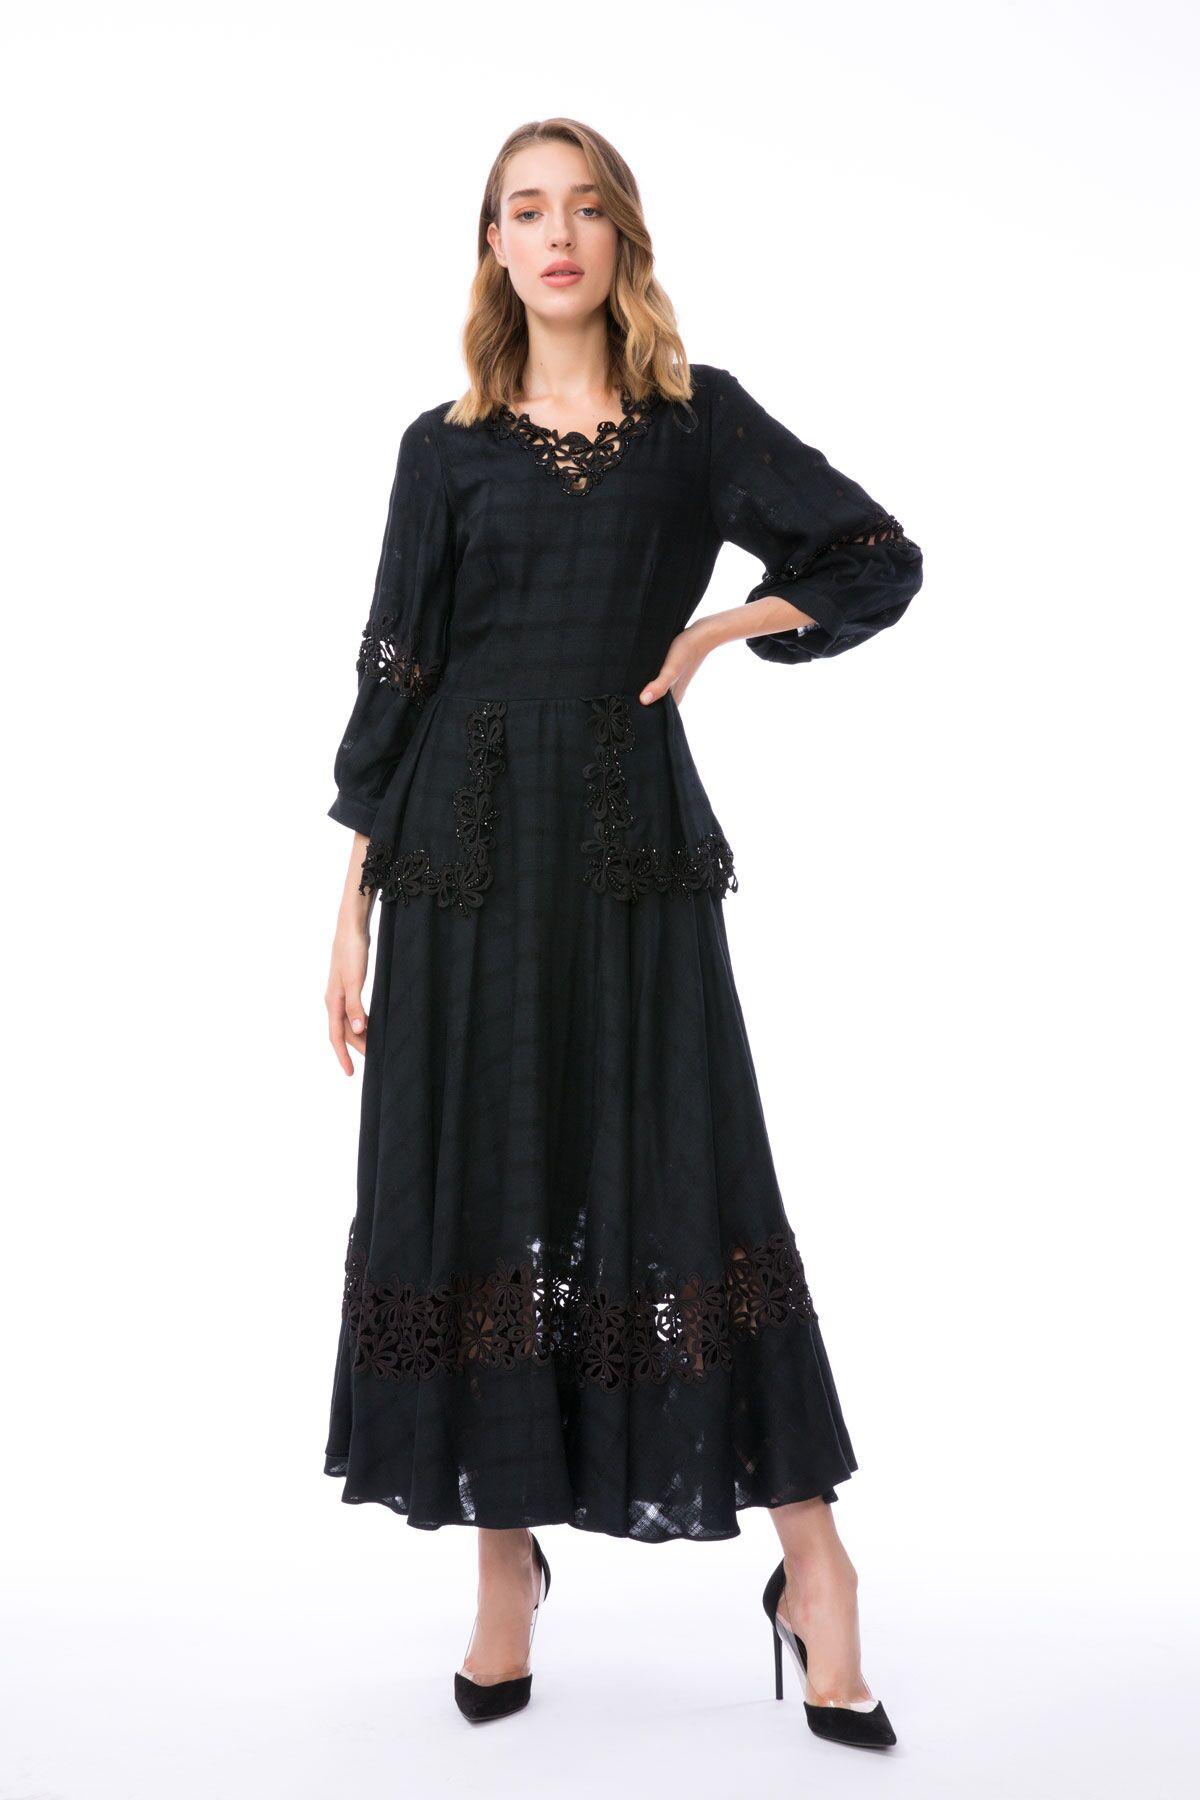 Dantel Detaylı Midi Boy Siyah Peplum Elbise